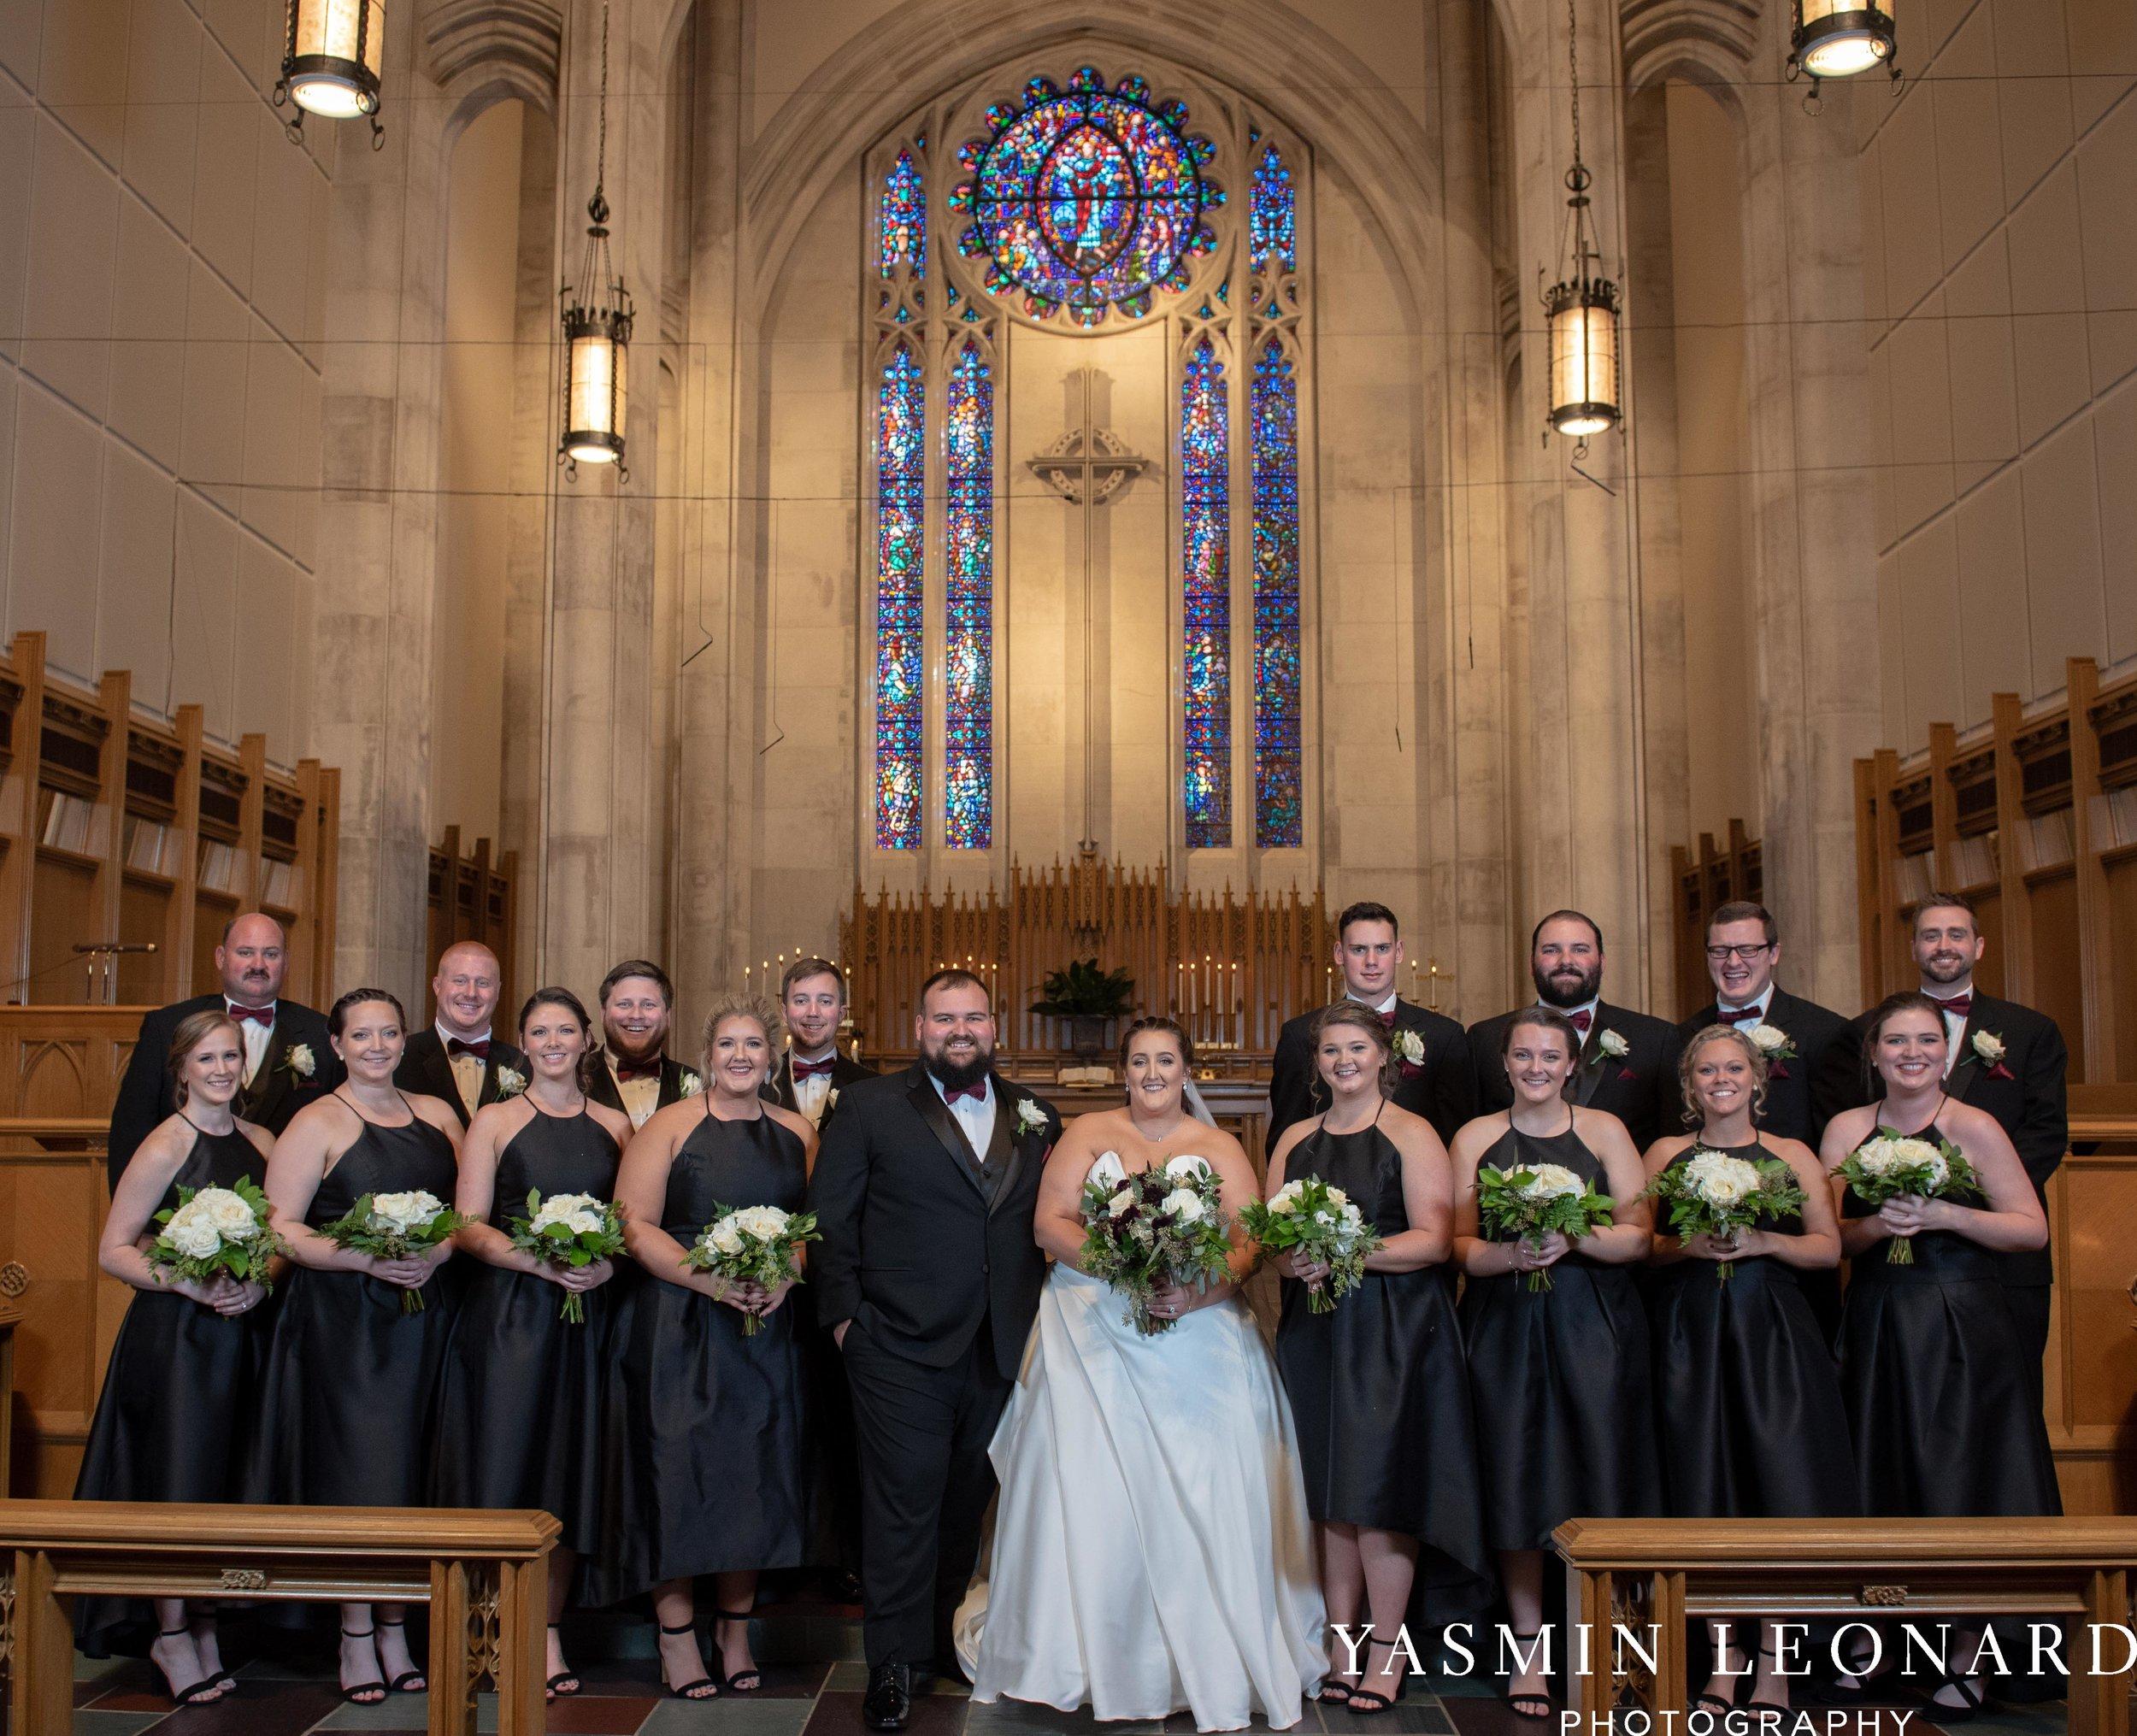 Wesley Memorial United Methodist Church - Old Homeplace Winery - High Point Weddings - High Point Wedding Photographer - NC Weddings - NC Barn Venue - Yasmin Leonard Photography-21.jpg